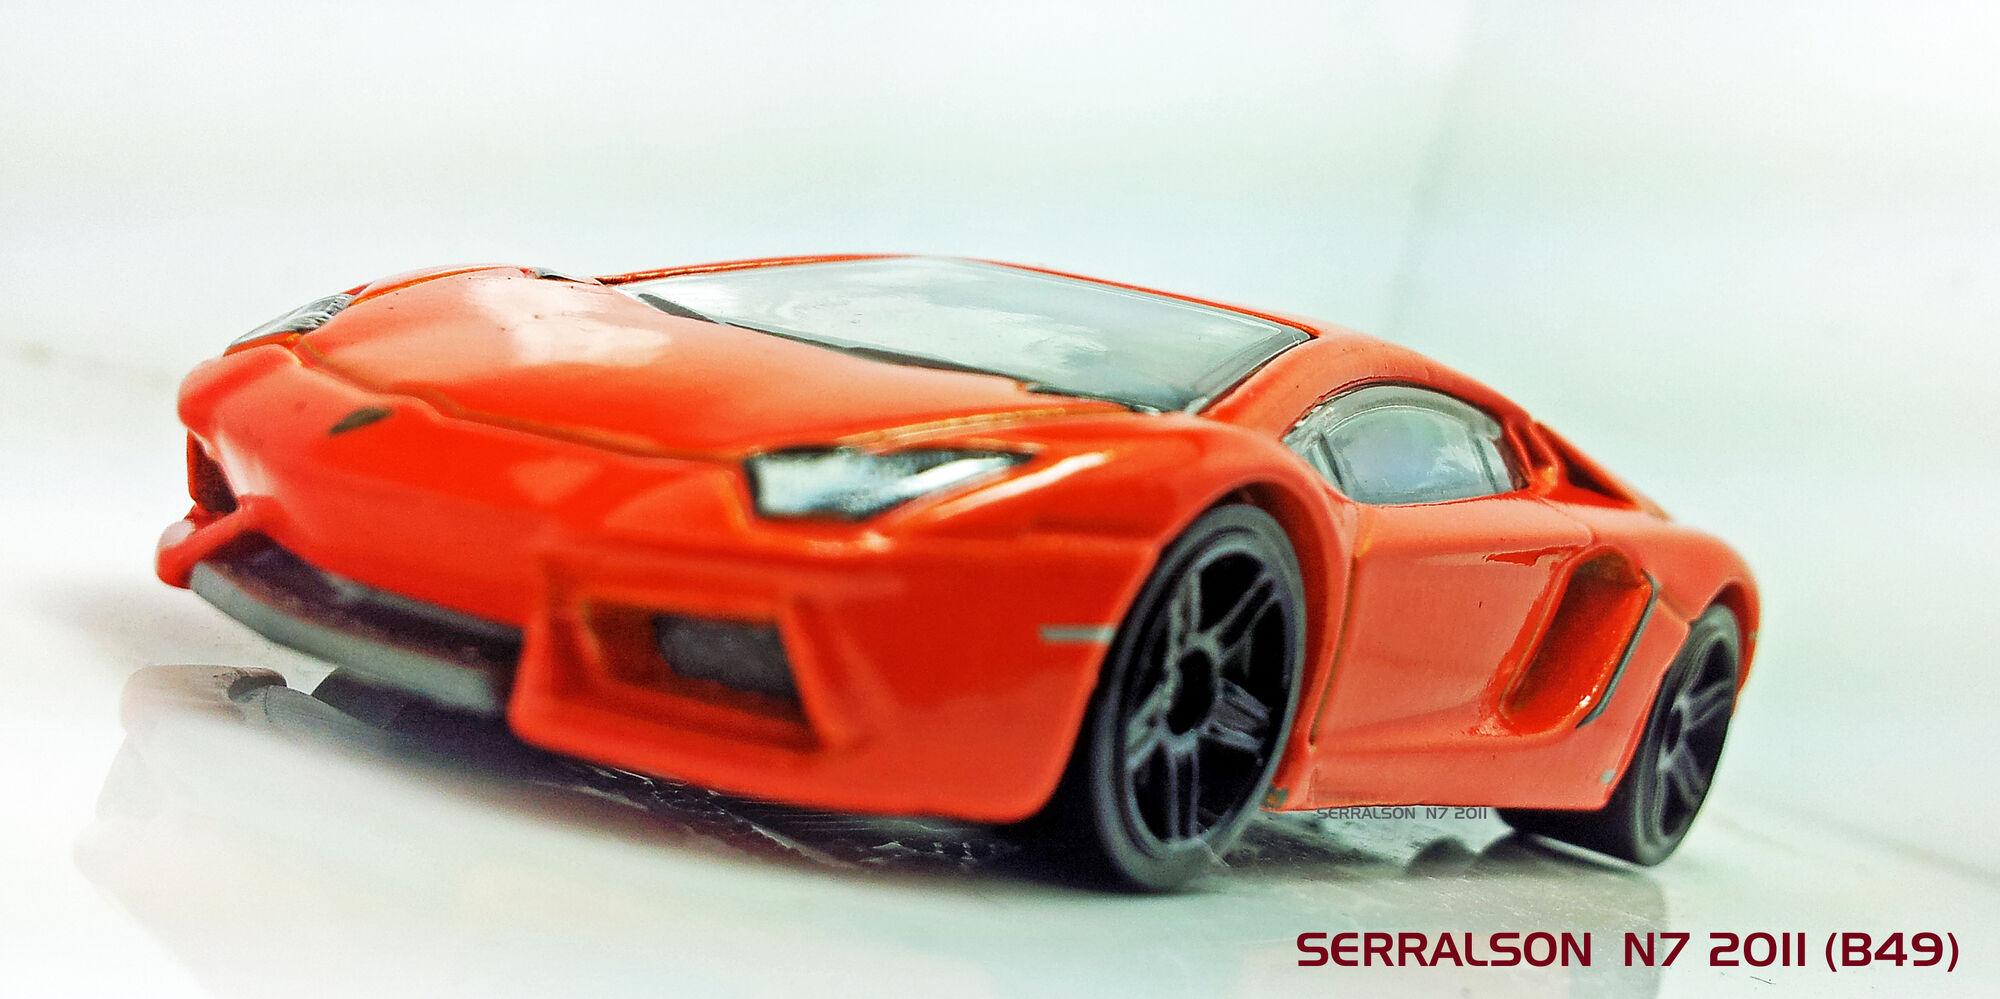 2000?cb=20111216141317 Surprising Lamborghini Gallardo Hot Wheels Wiki Cars Trend